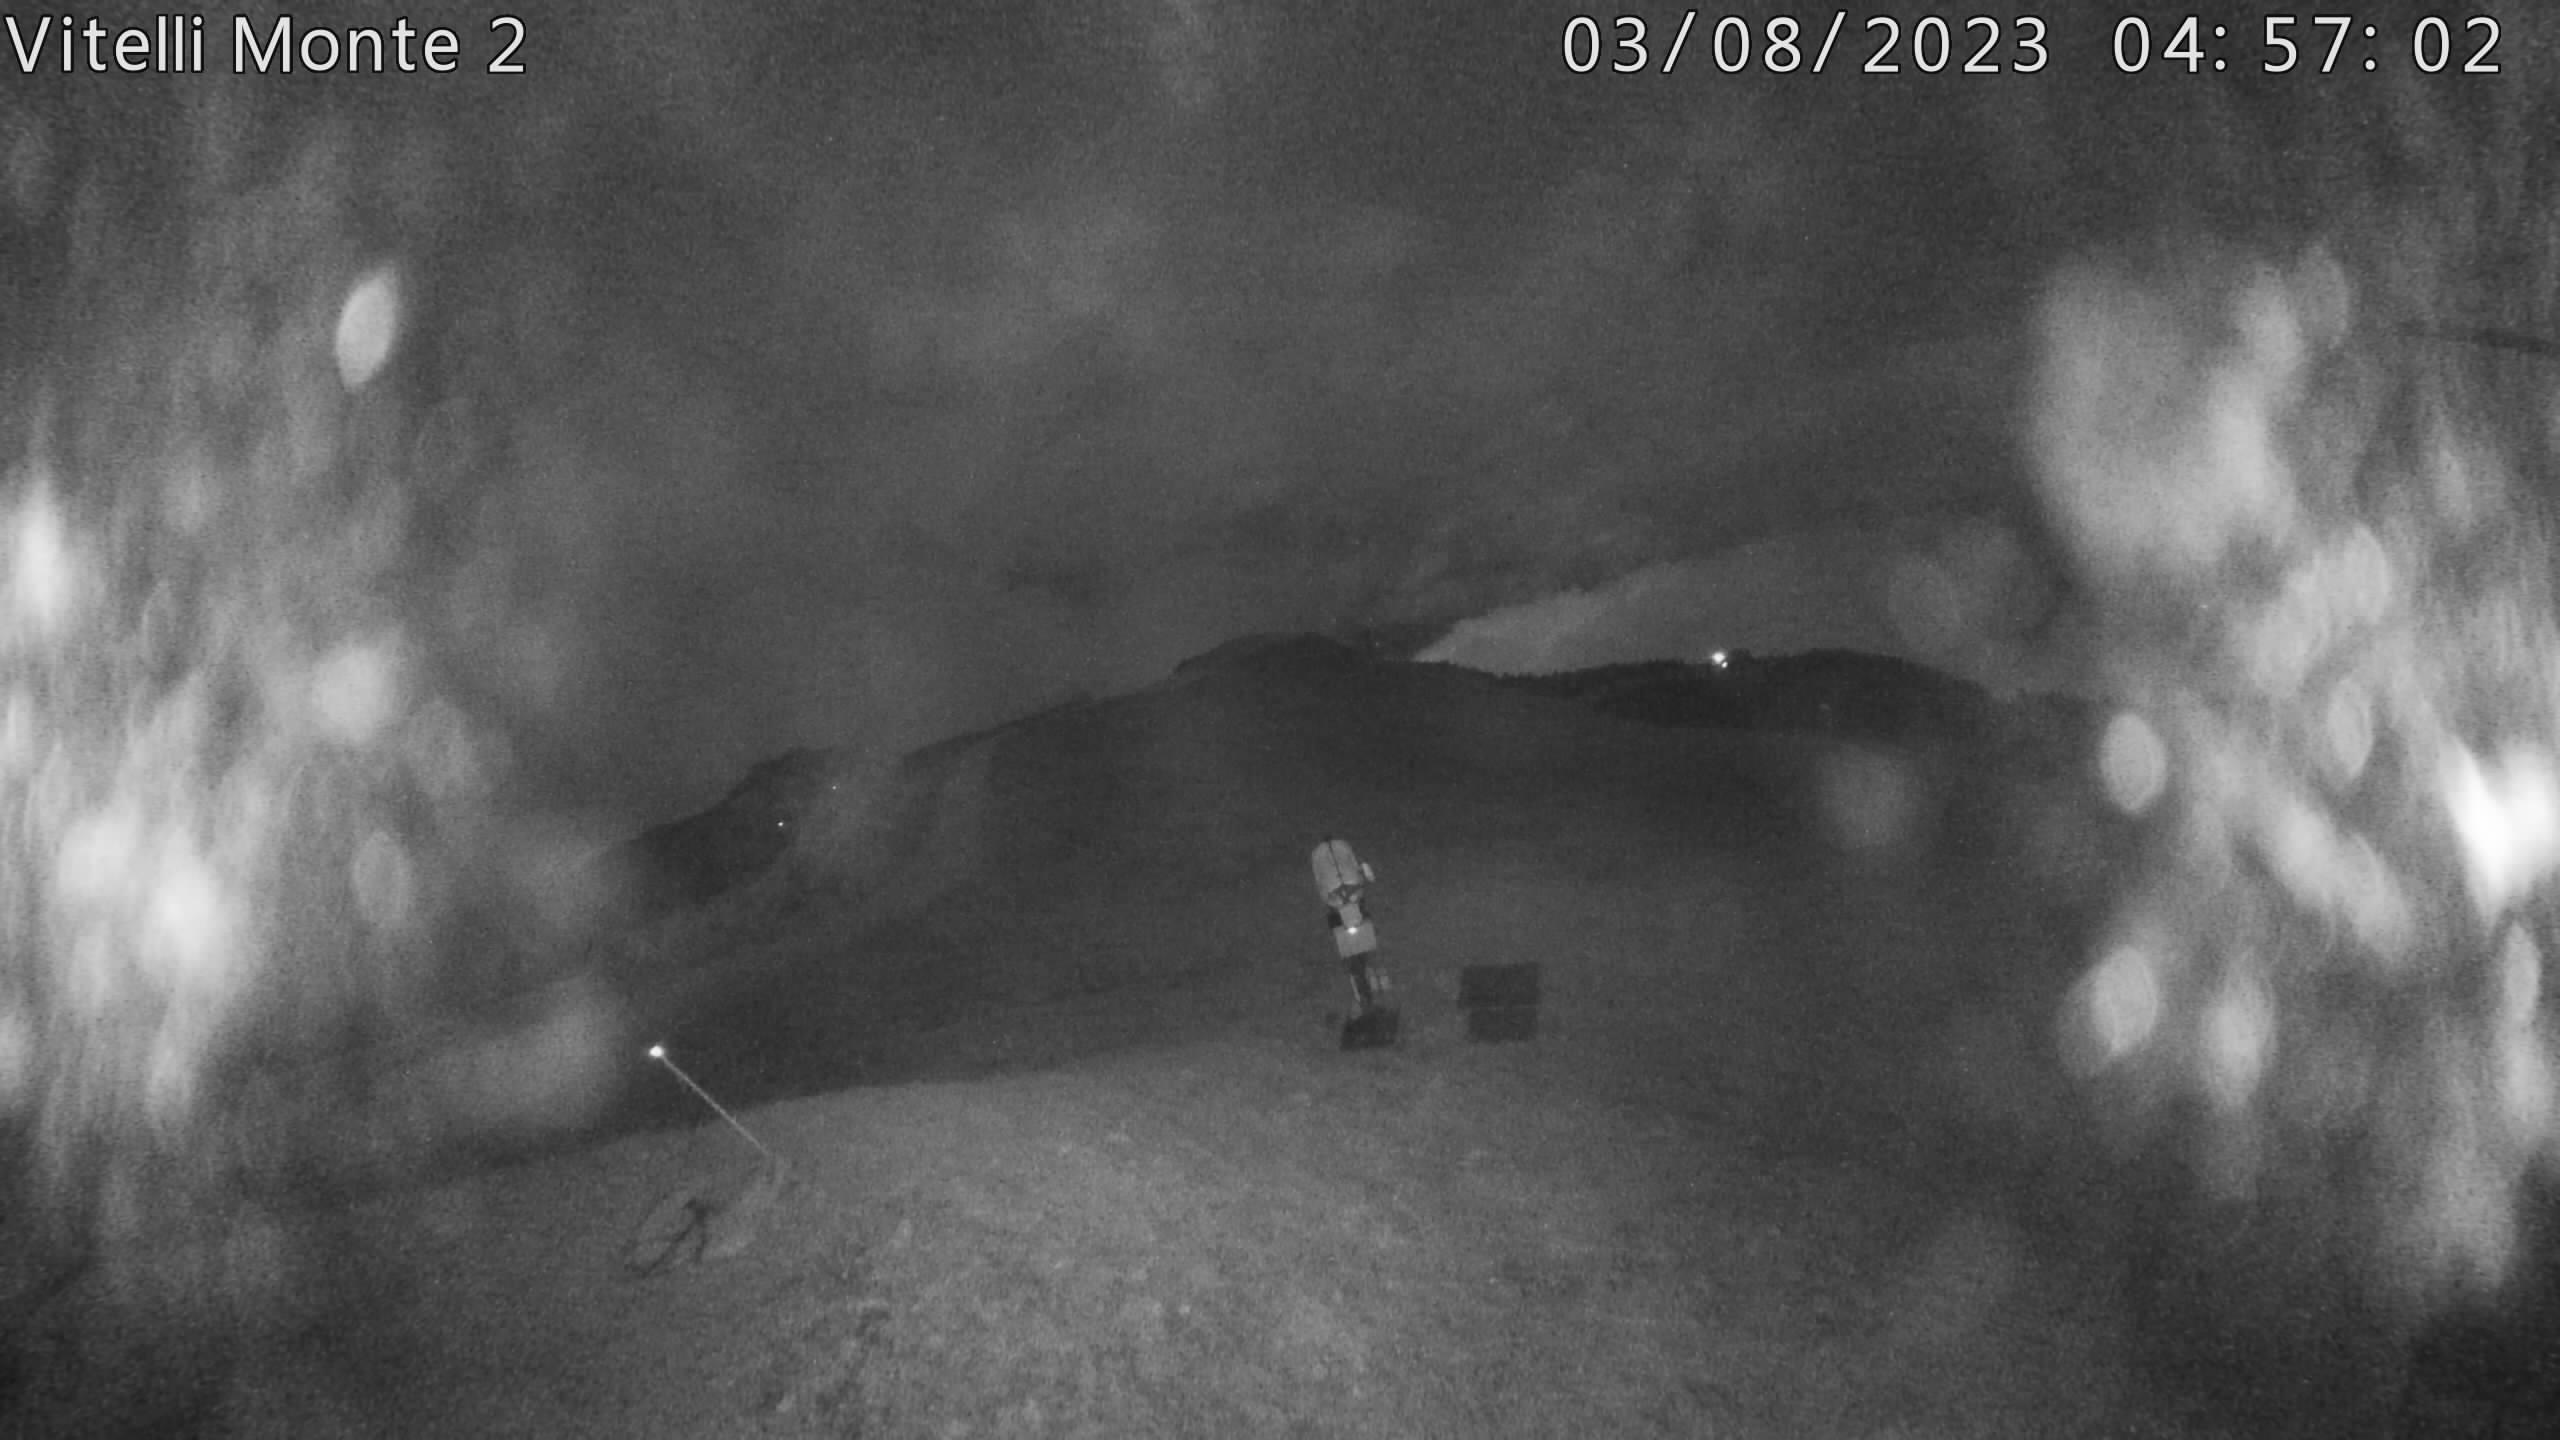 Seggiovia Vitelli - Vista su Marmolada, Nuvolao, Averau, 5 Torri, Piz Boè, Tofana di Rozes